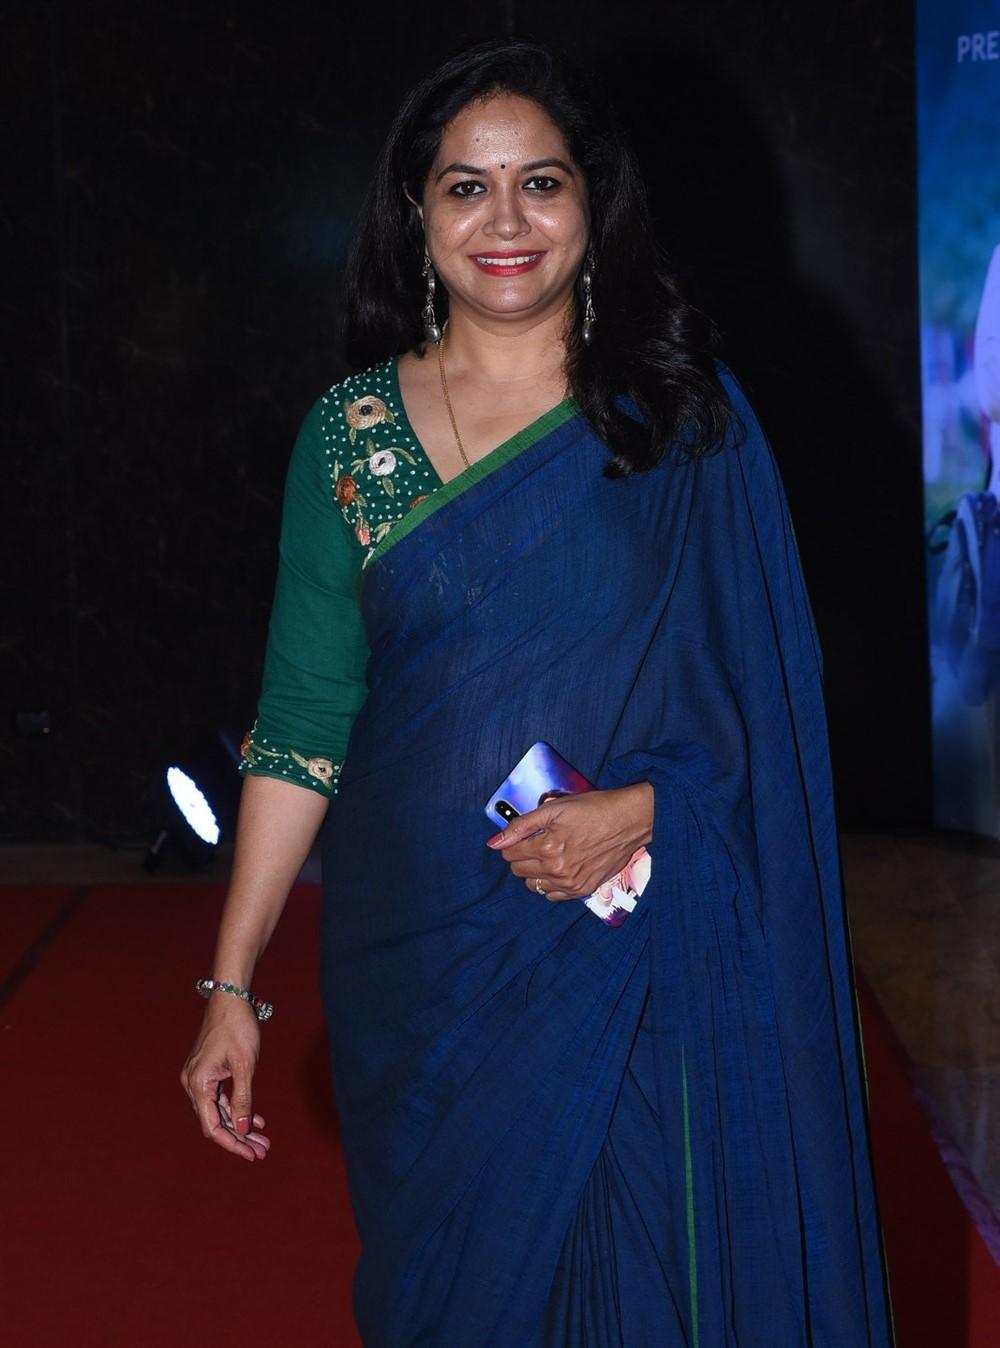 Singer Sunitha Upadrashta Blue Saree Pictures